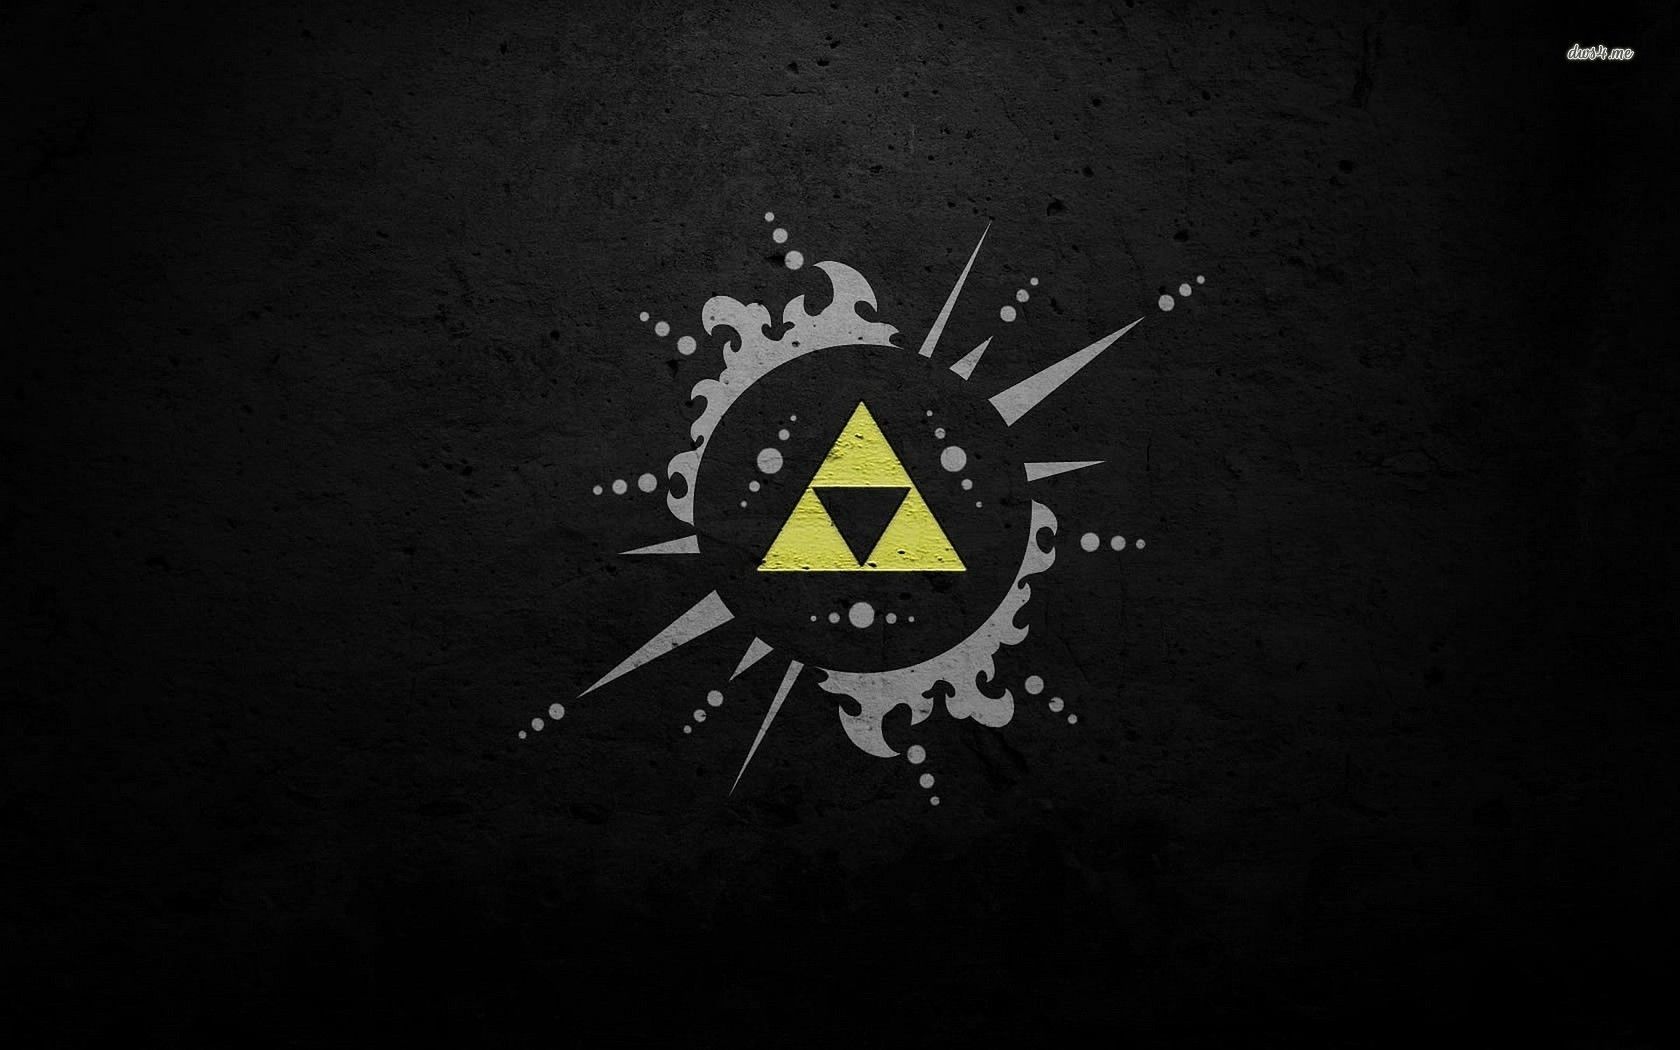 Zelda Backgrounds free download (With images) Black